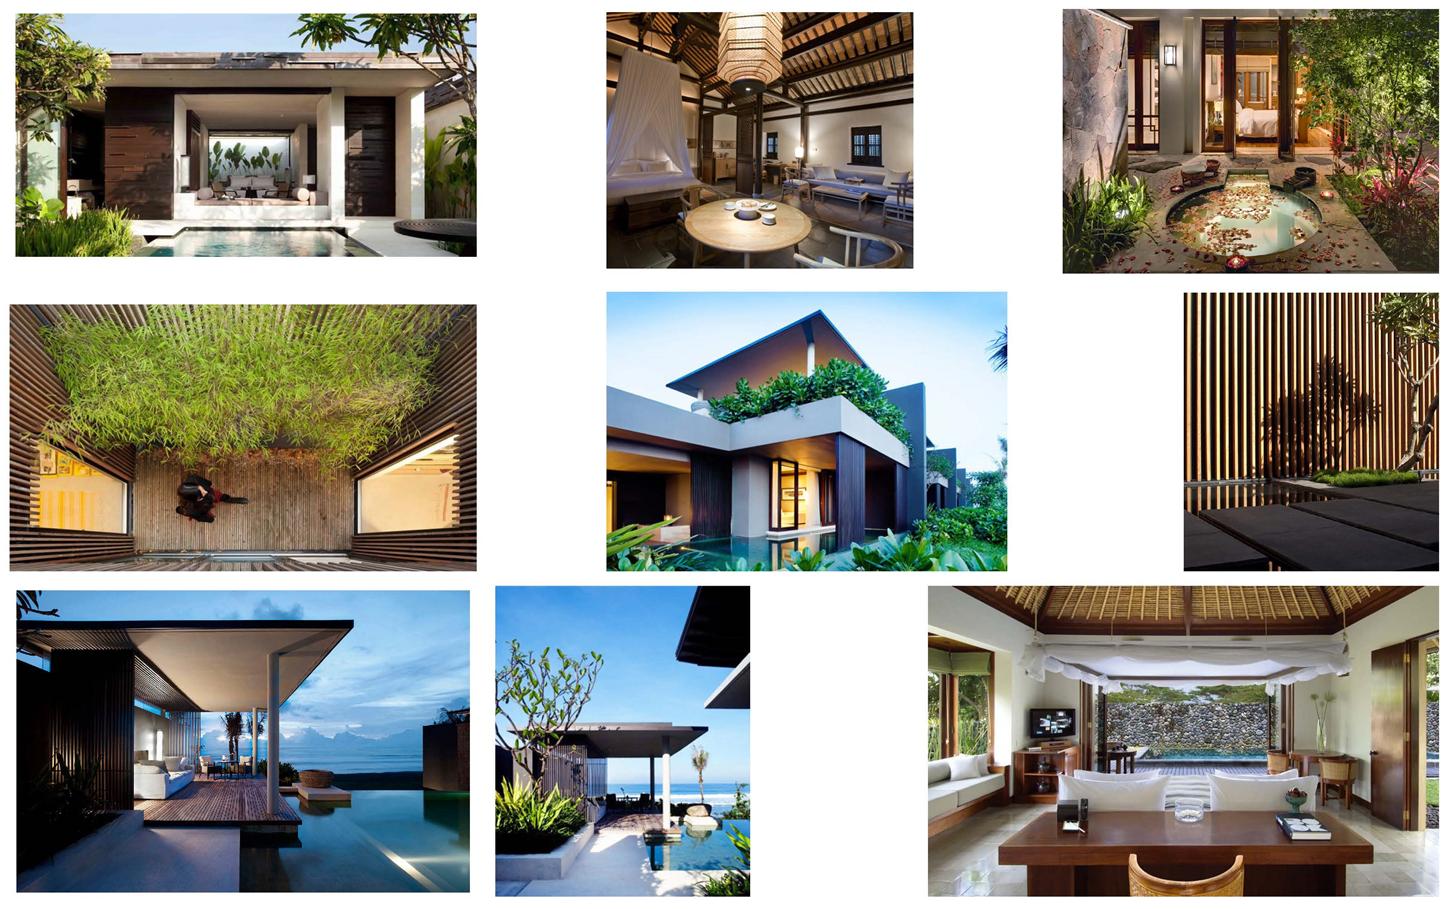 charles_tang_design_hangzhou_mangrove_tree_resort_villa_china 6